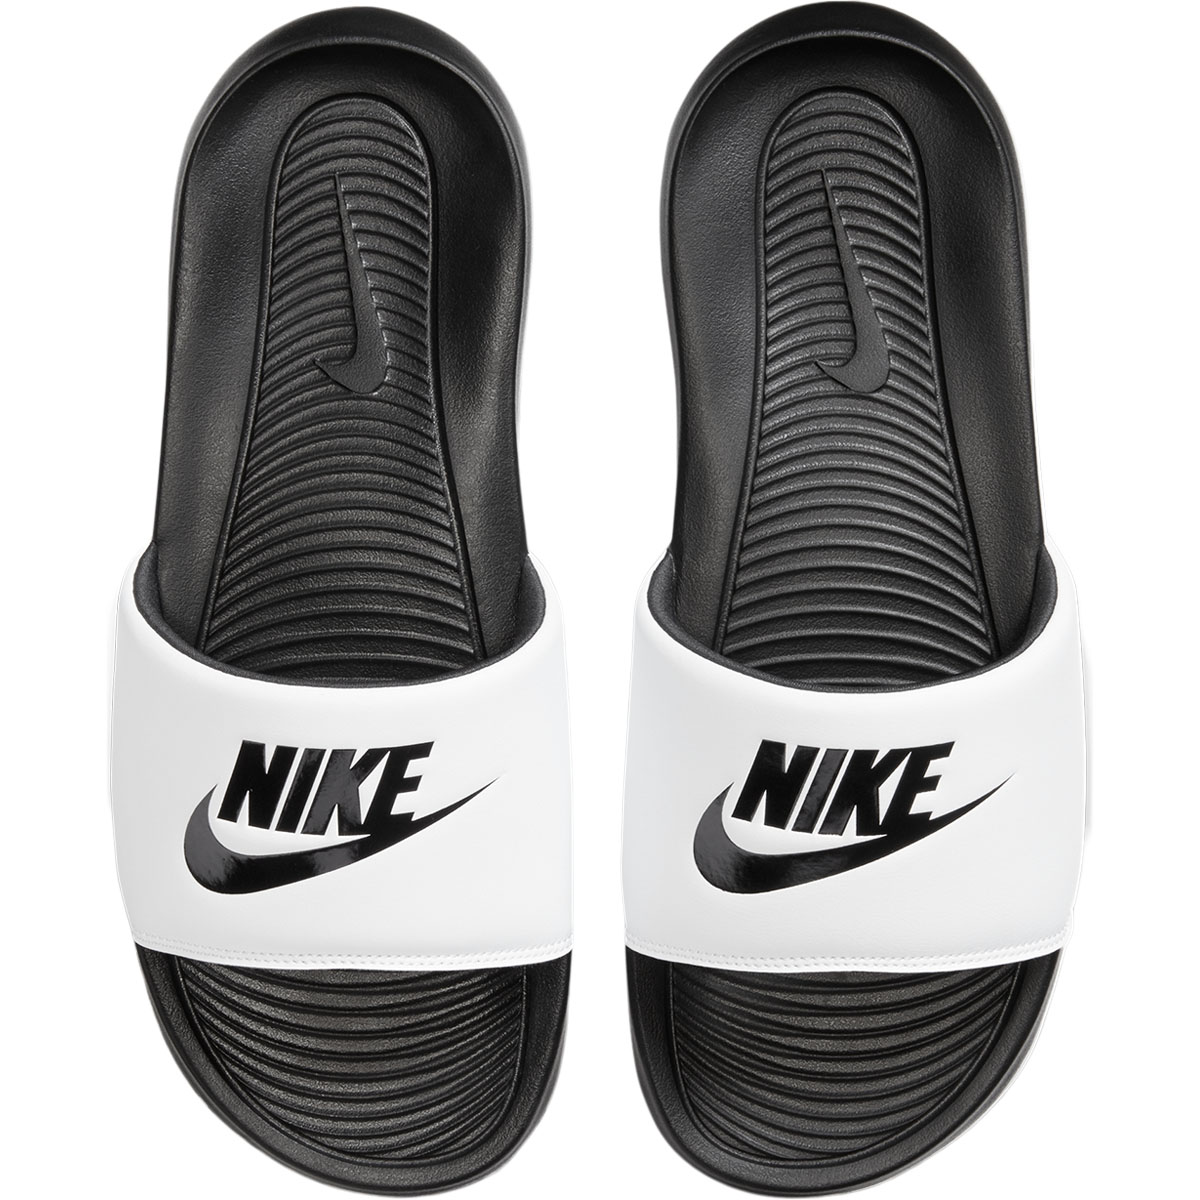 Nike Victori One Slide Badesandaler Herre